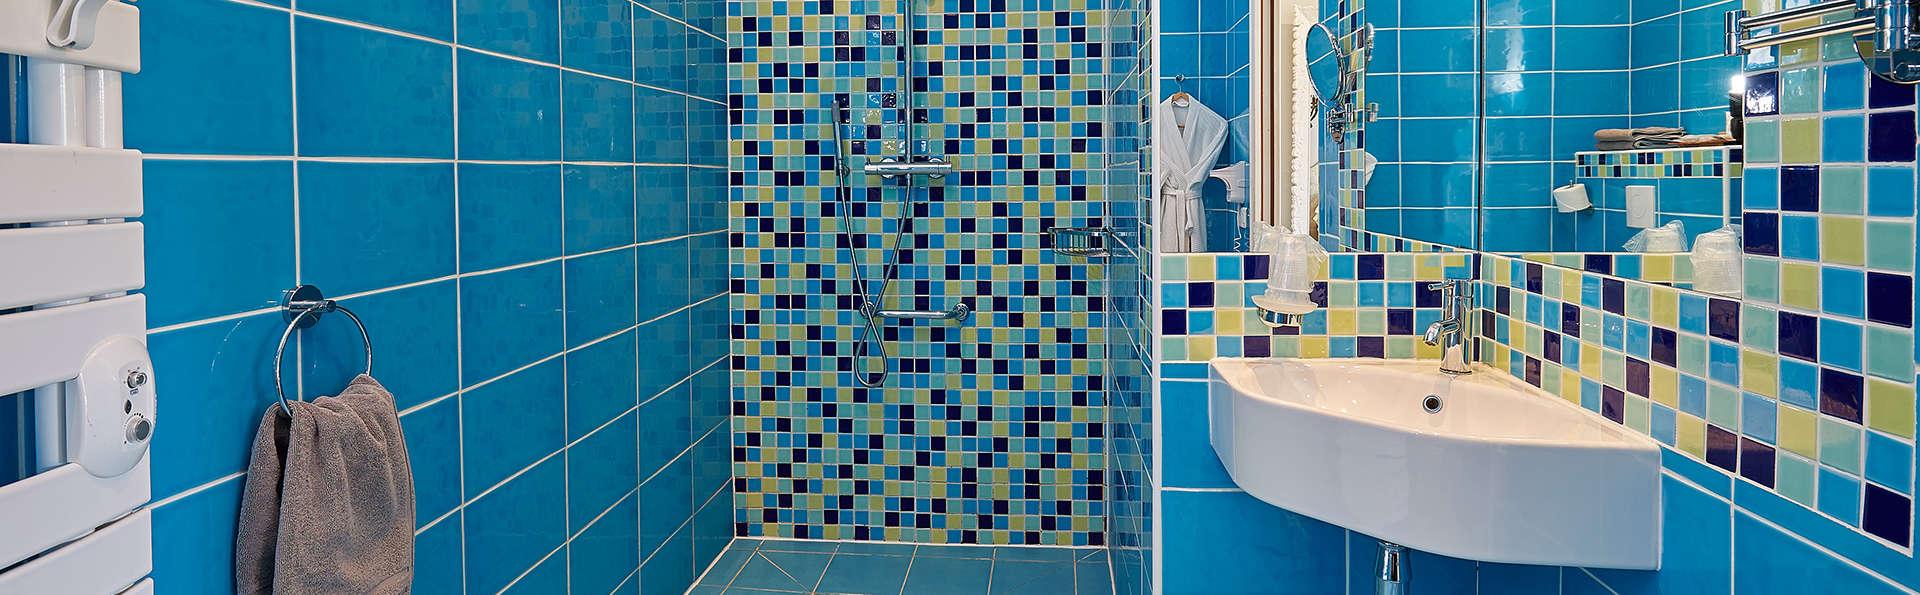 Hotel The Originals Le Cise (ex Relais du Silence) - edit_new_bathroom4.jpg